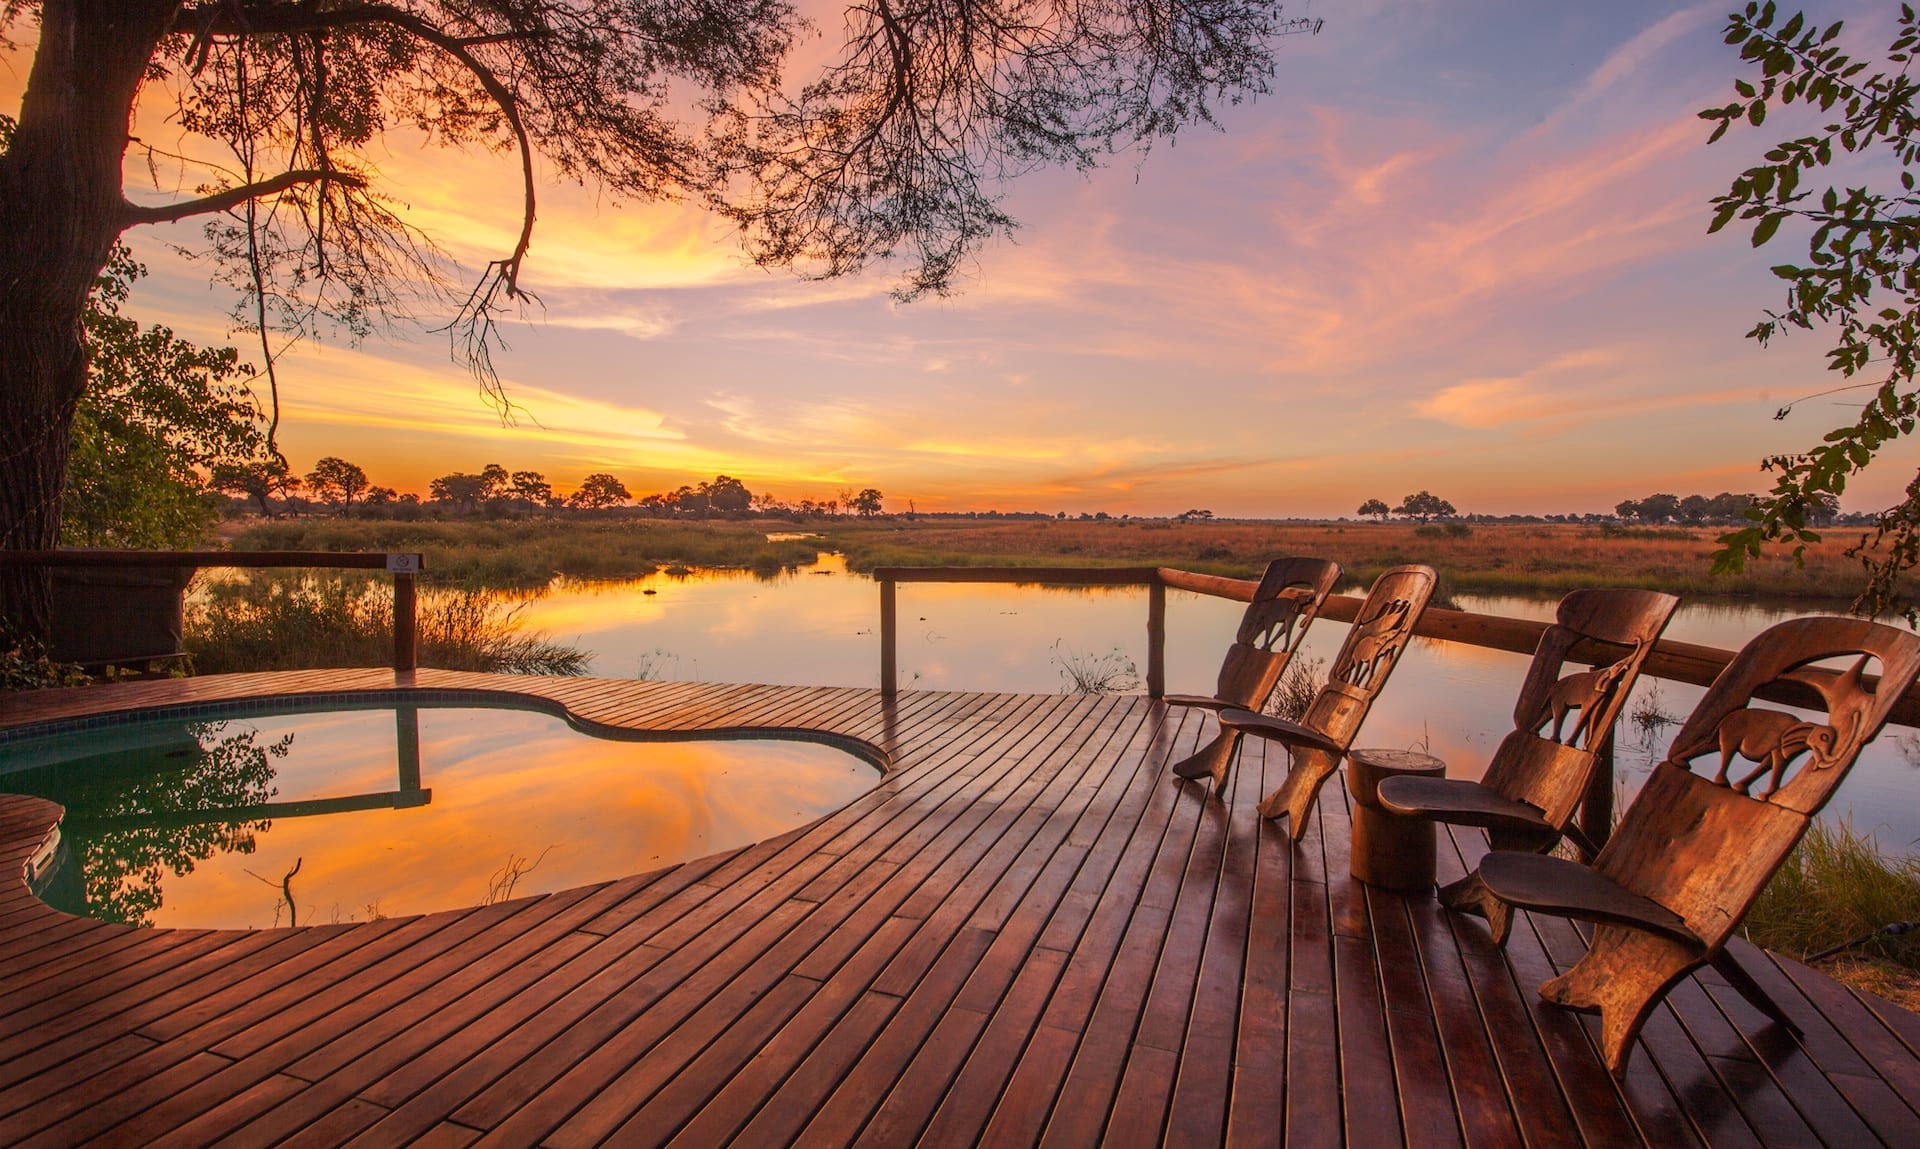 ALGEMEEN 3 - kwando_lagoon_sunset_by_pool - BW 2